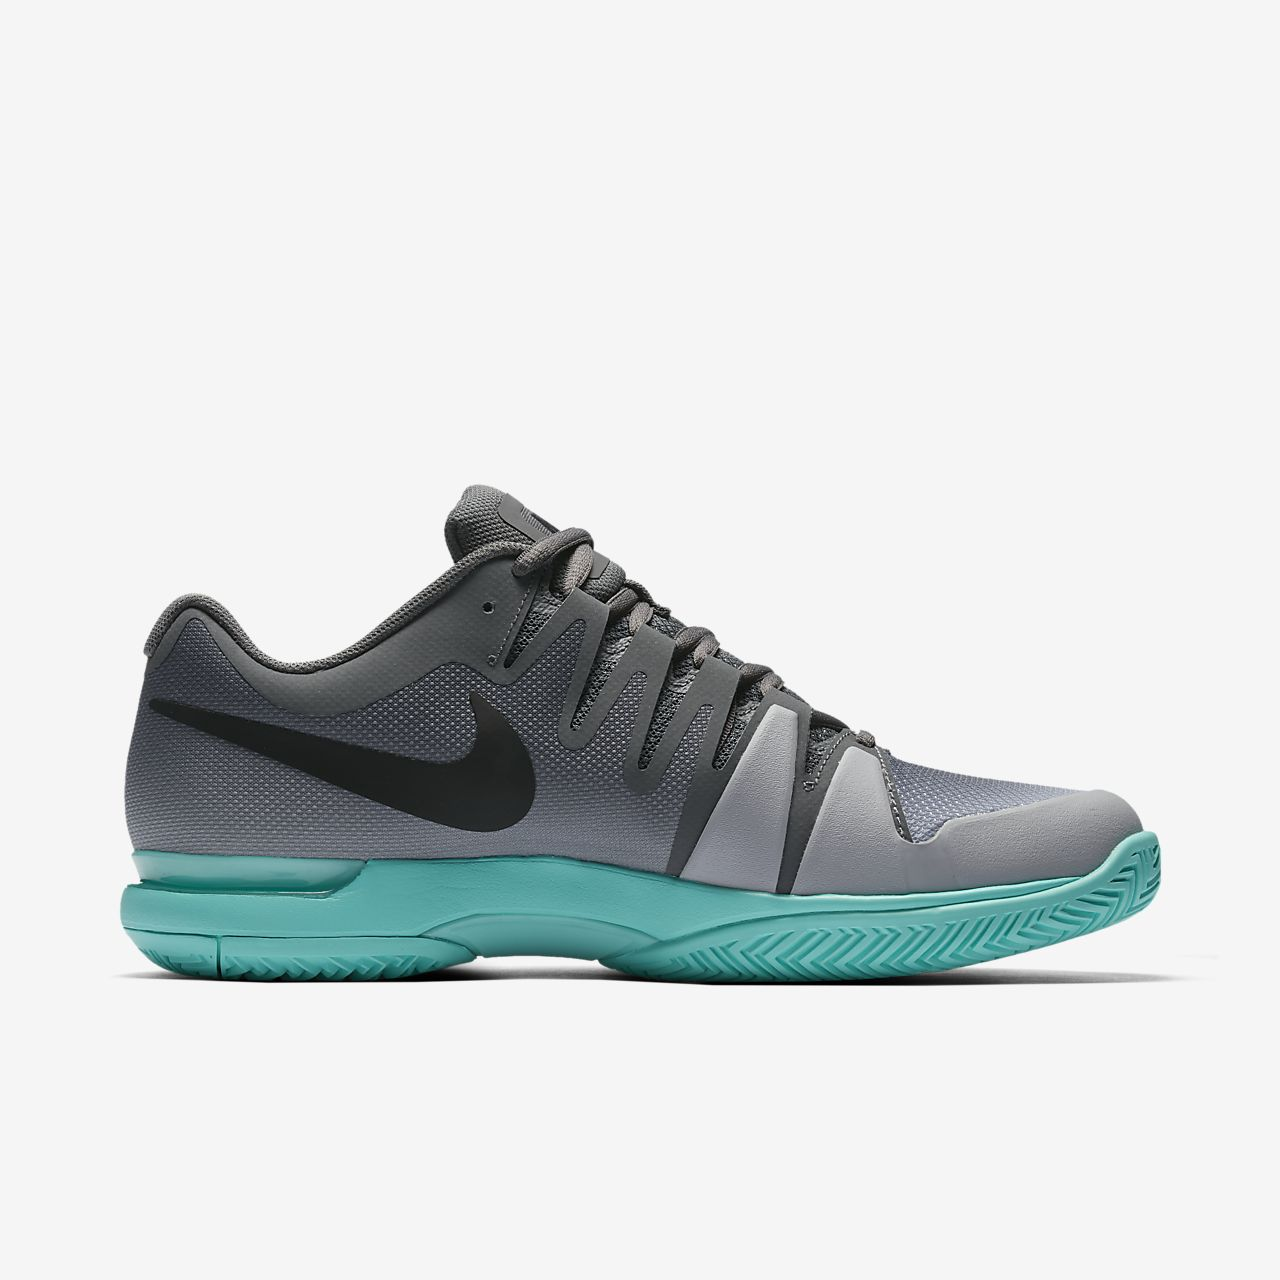 ... NikeCourt Zoom Vapor 9.5 Tour Men's Tennis Shoe